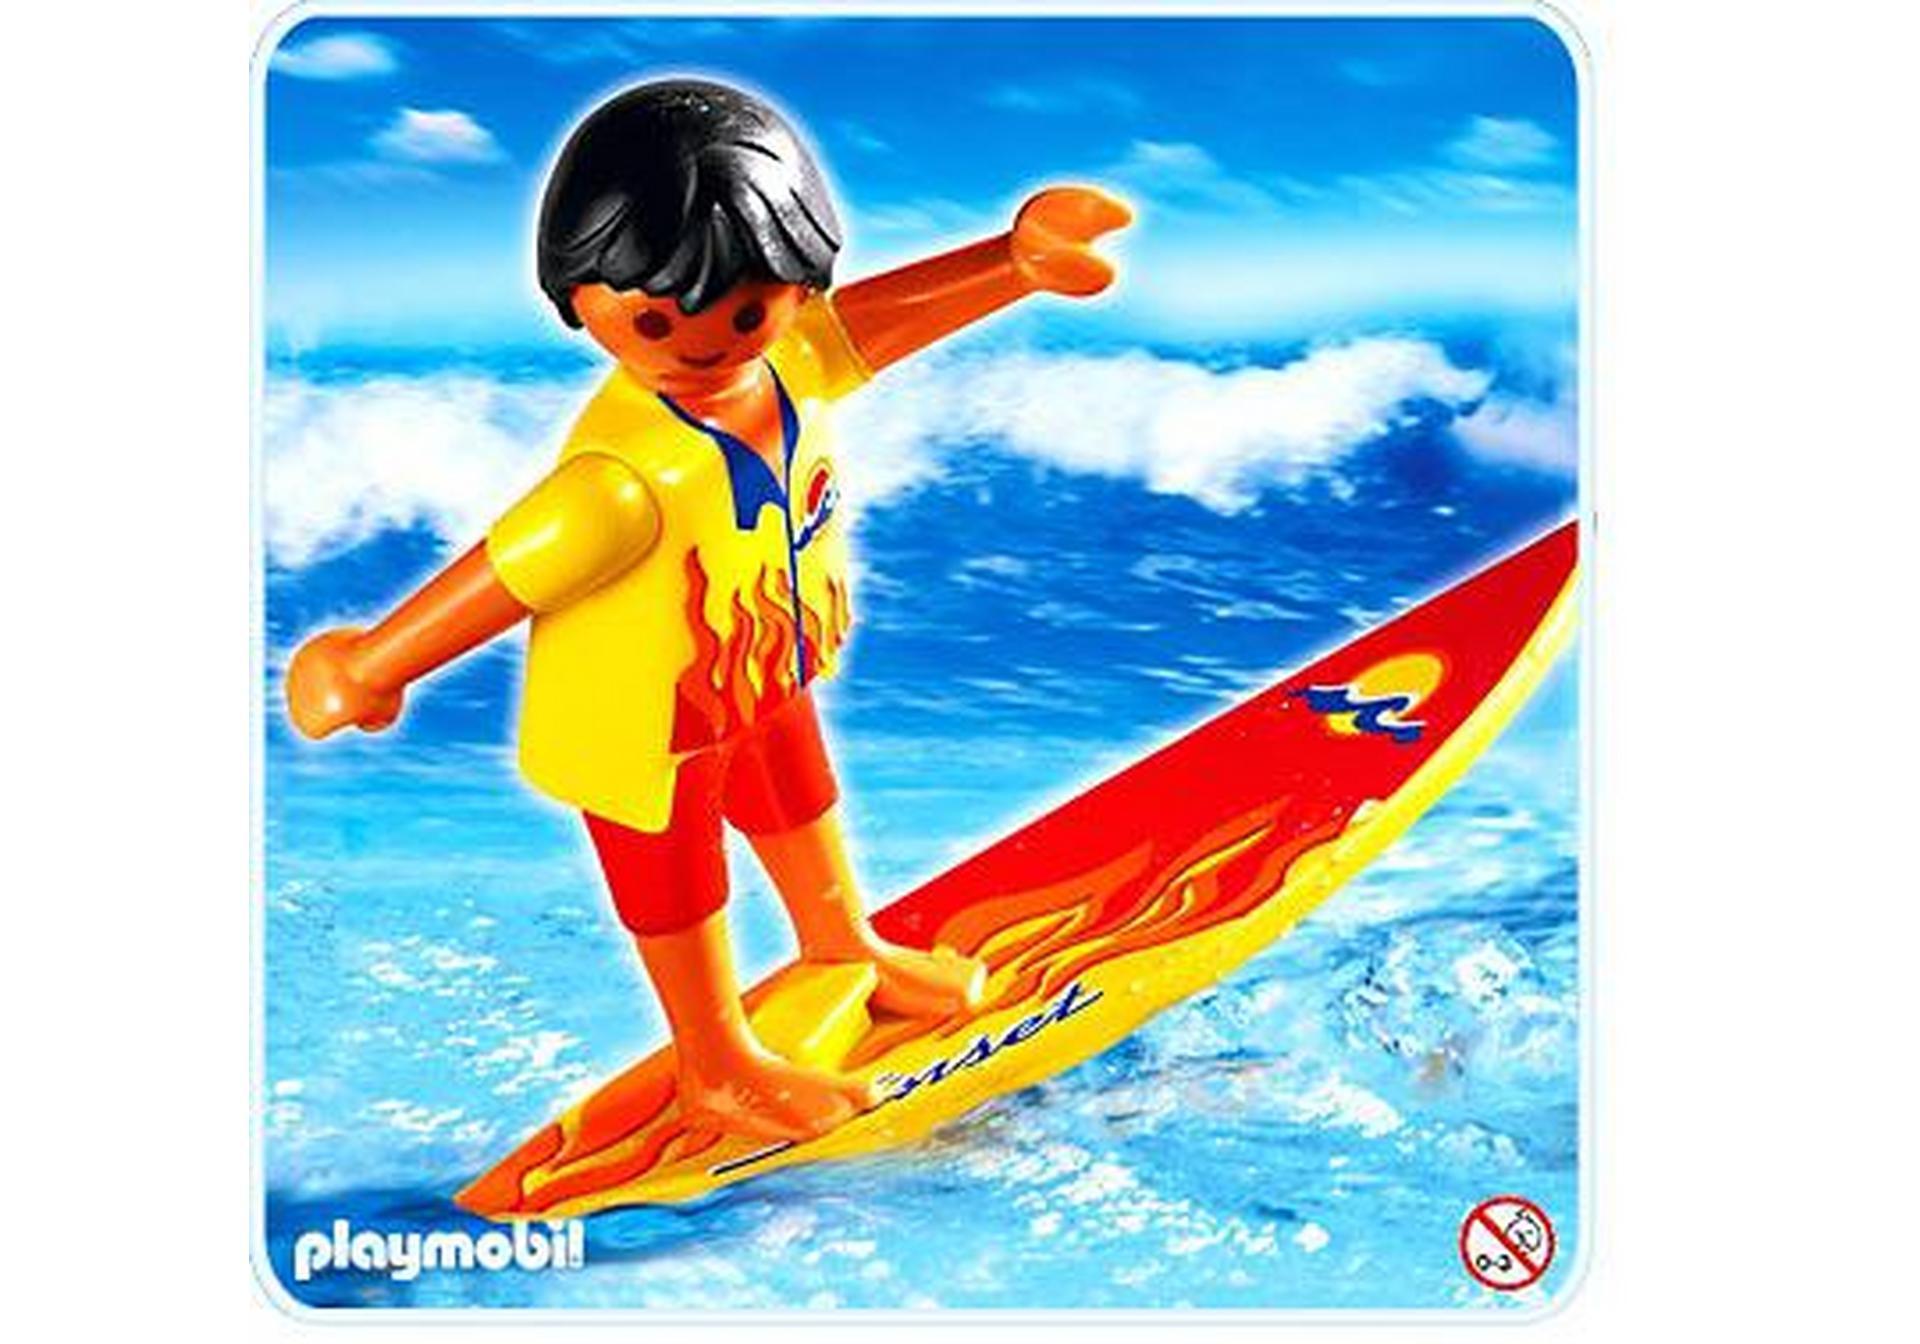 Playmobil Ausmalbilder Kinderklinik : Surfer 4637 A Playmobil Deutschland